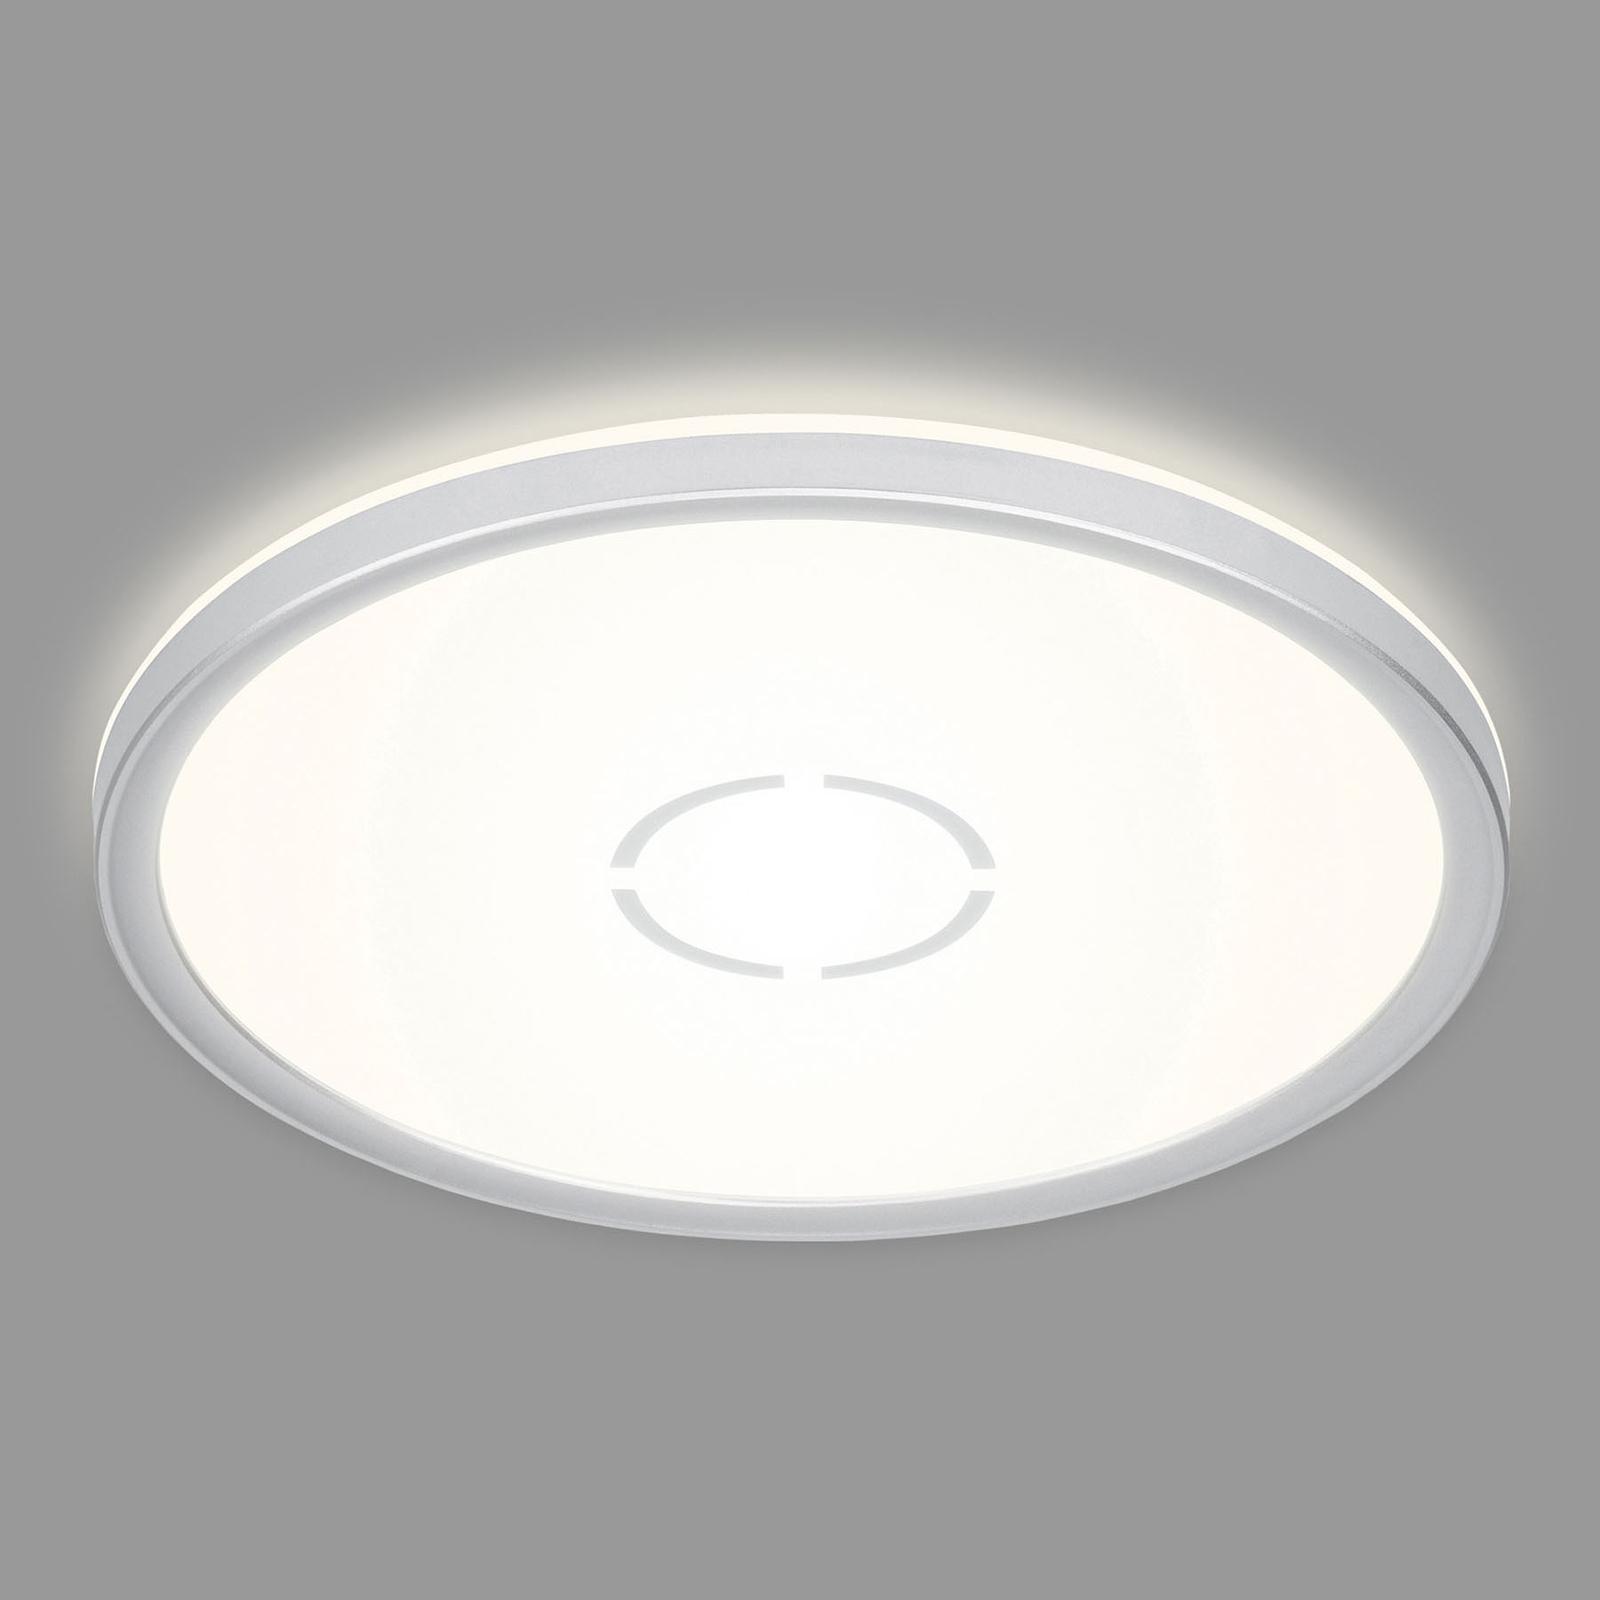 Lampa sufitowa LED Free Ø 29 cm, srebrna